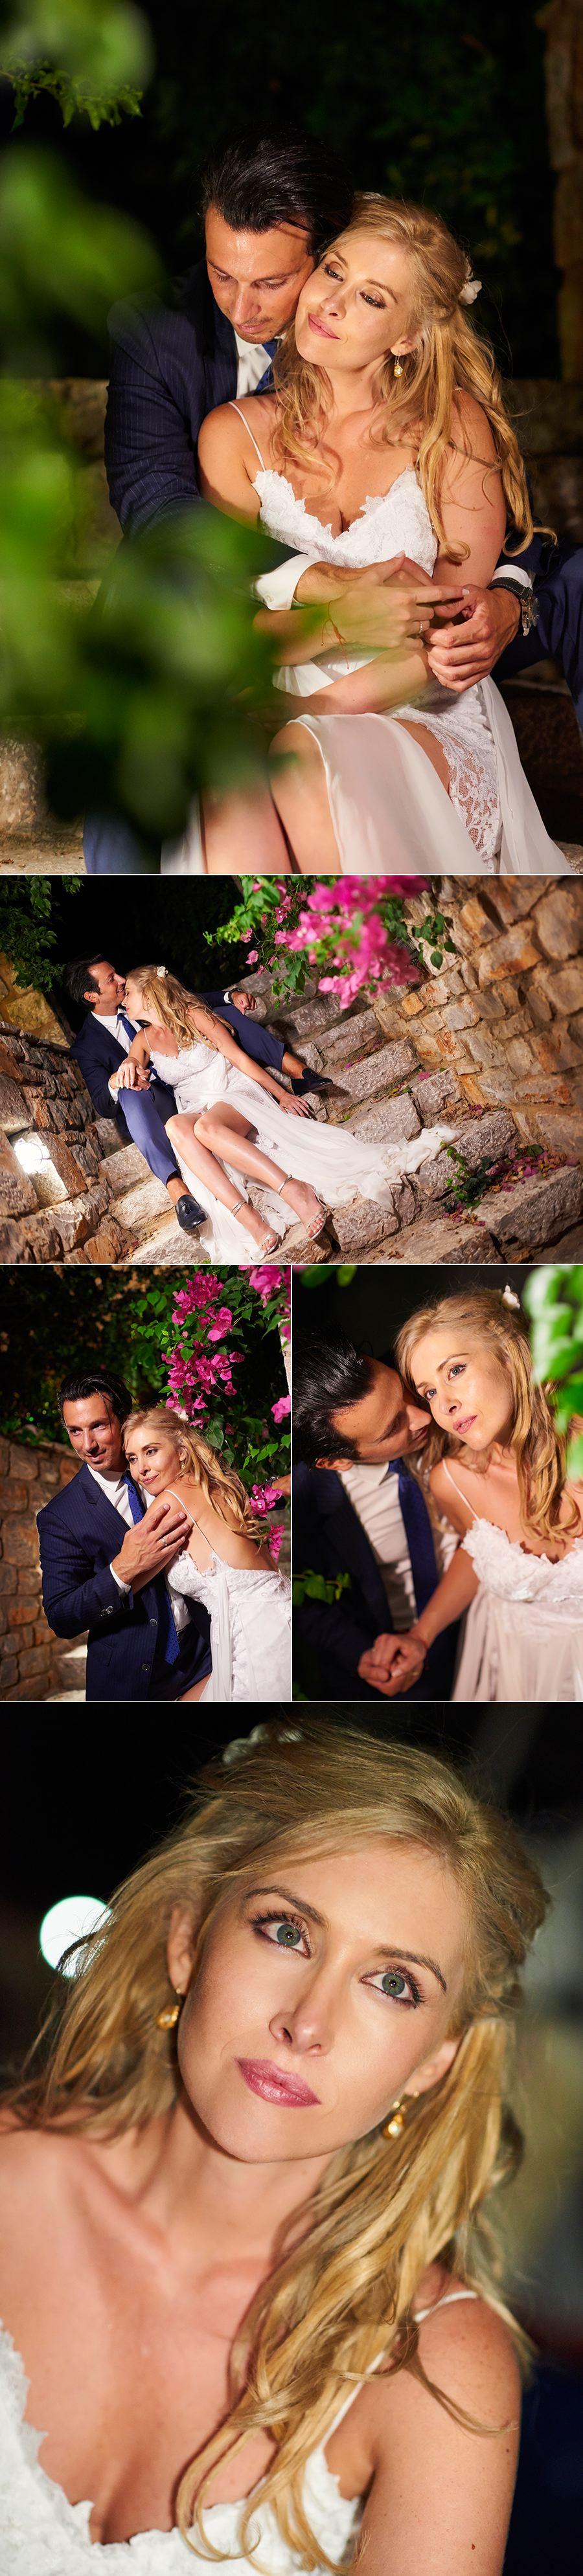 giannis-stella-wedding-photo-14